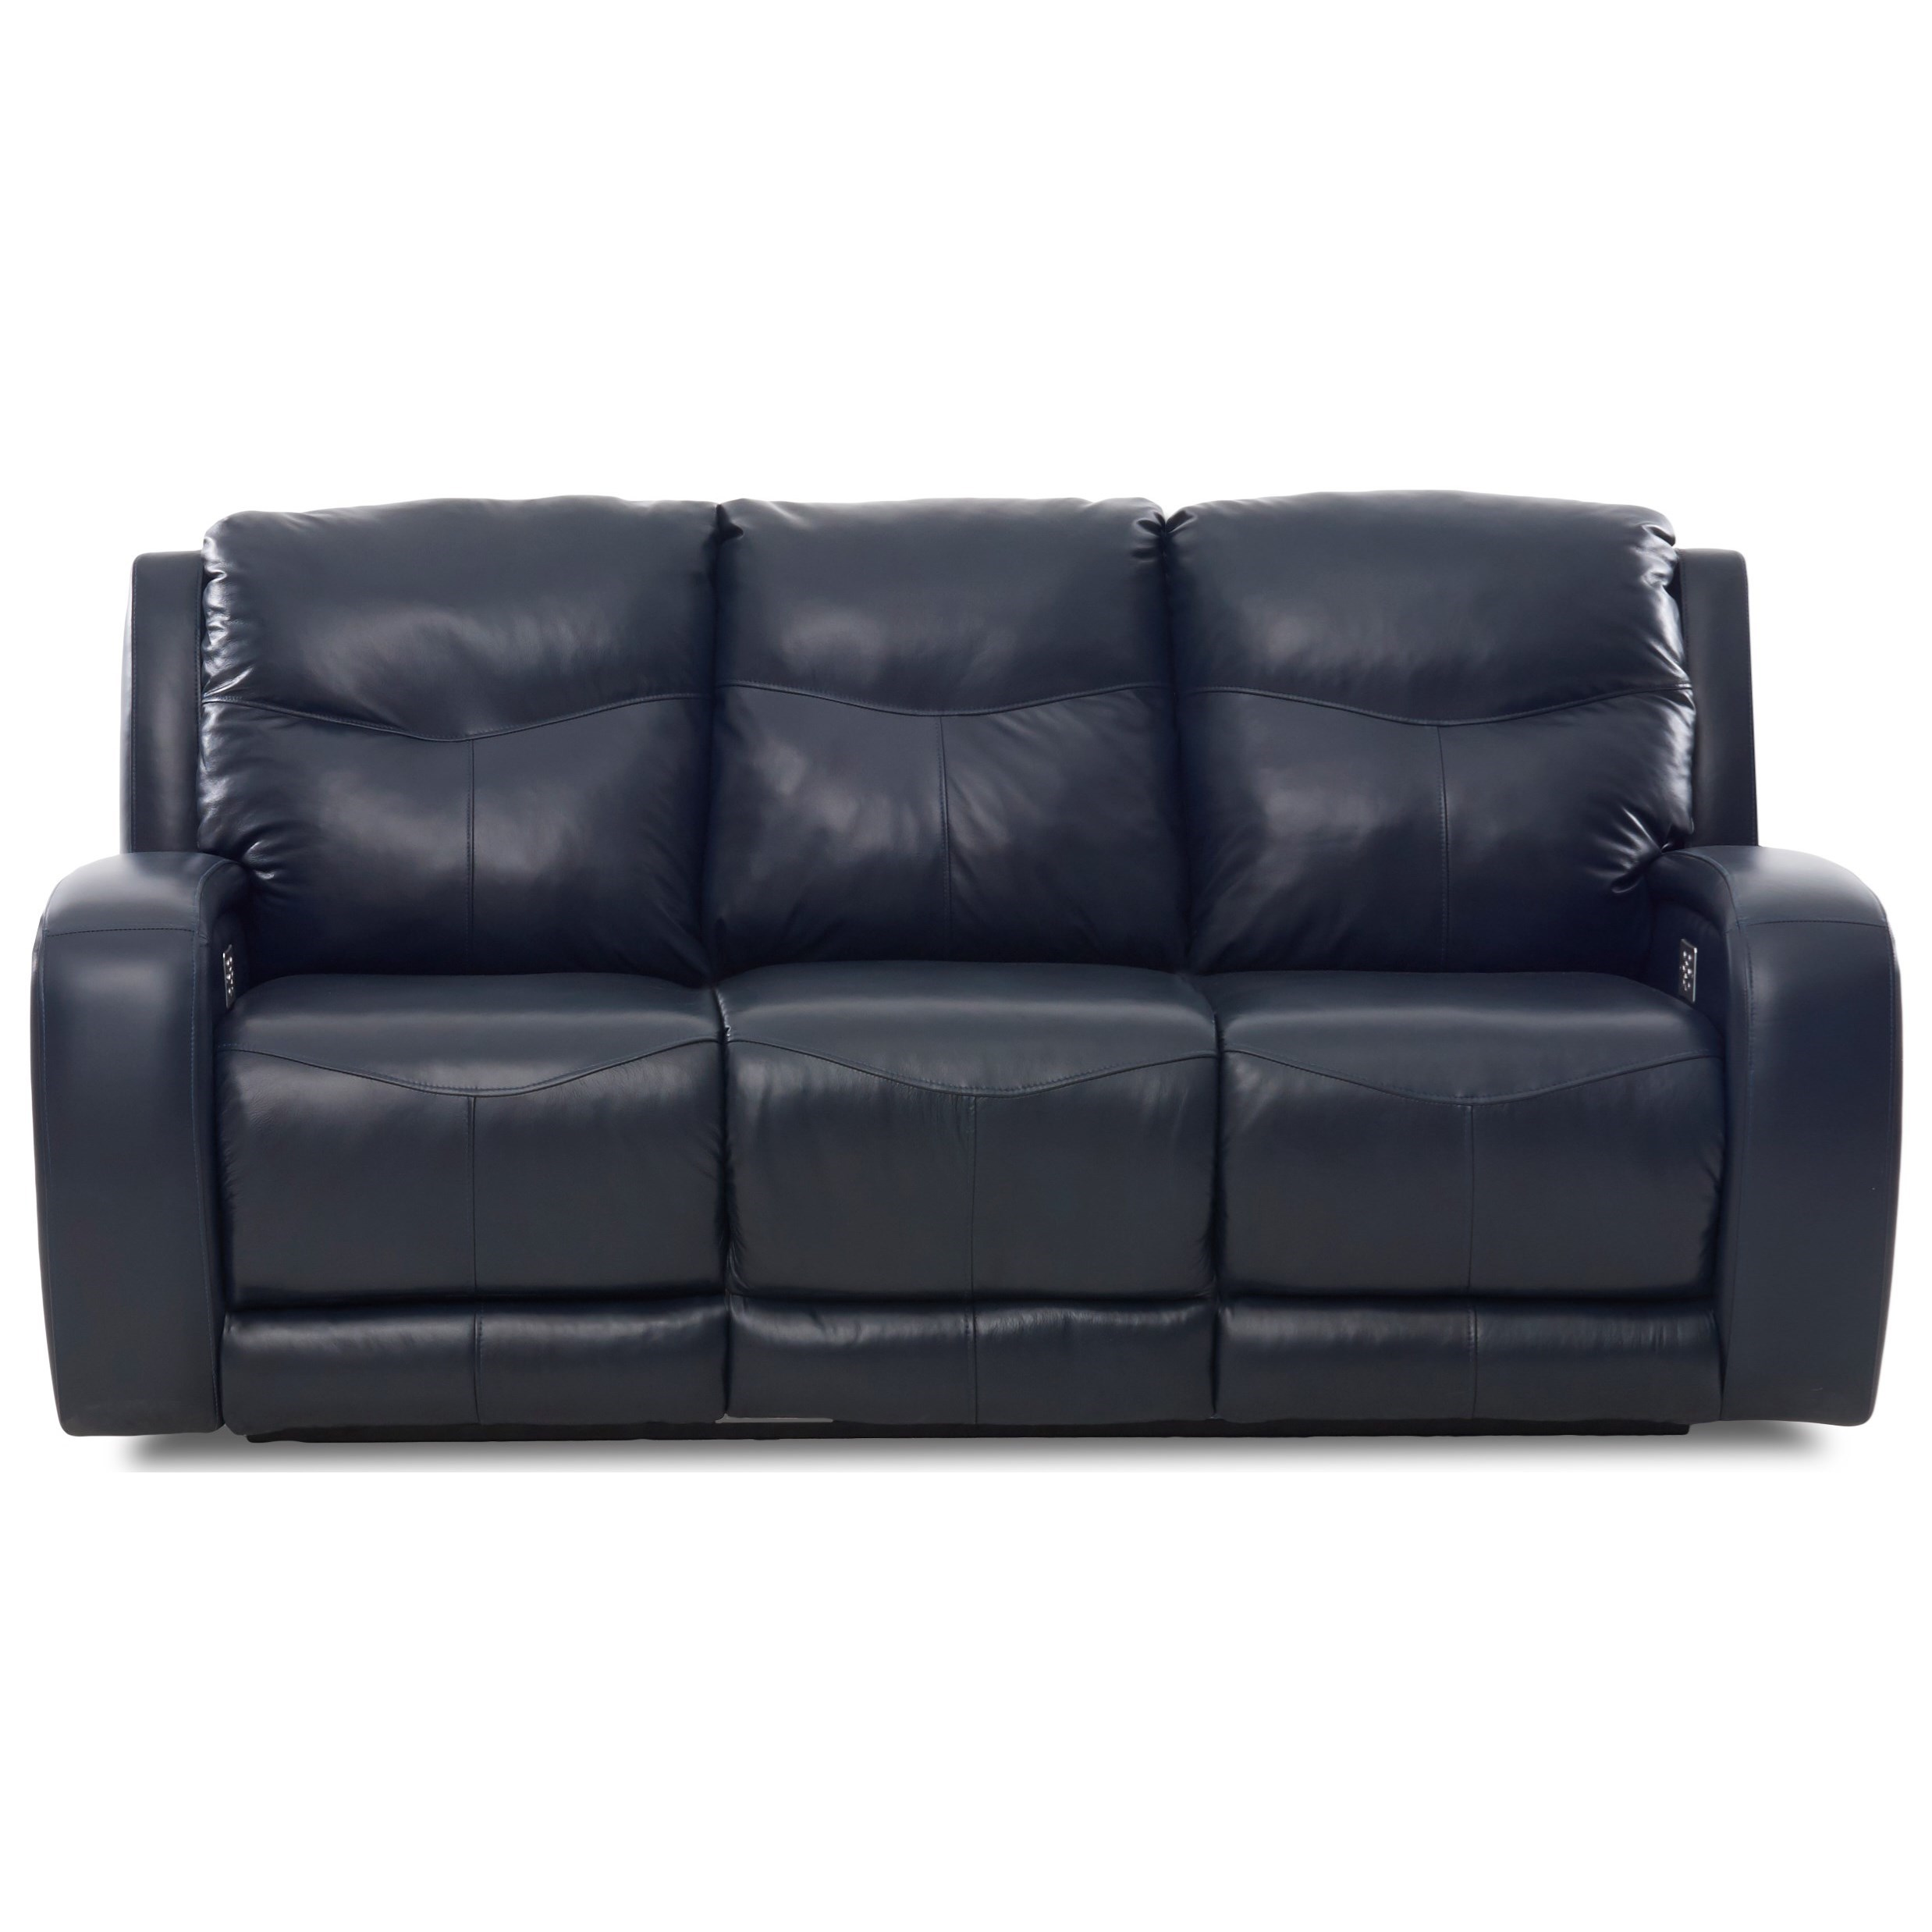 Remarkable Terra Power Reclining Sofa W Power Headrests Alphanode Cool Chair Designs And Ideas Alphanodeonline